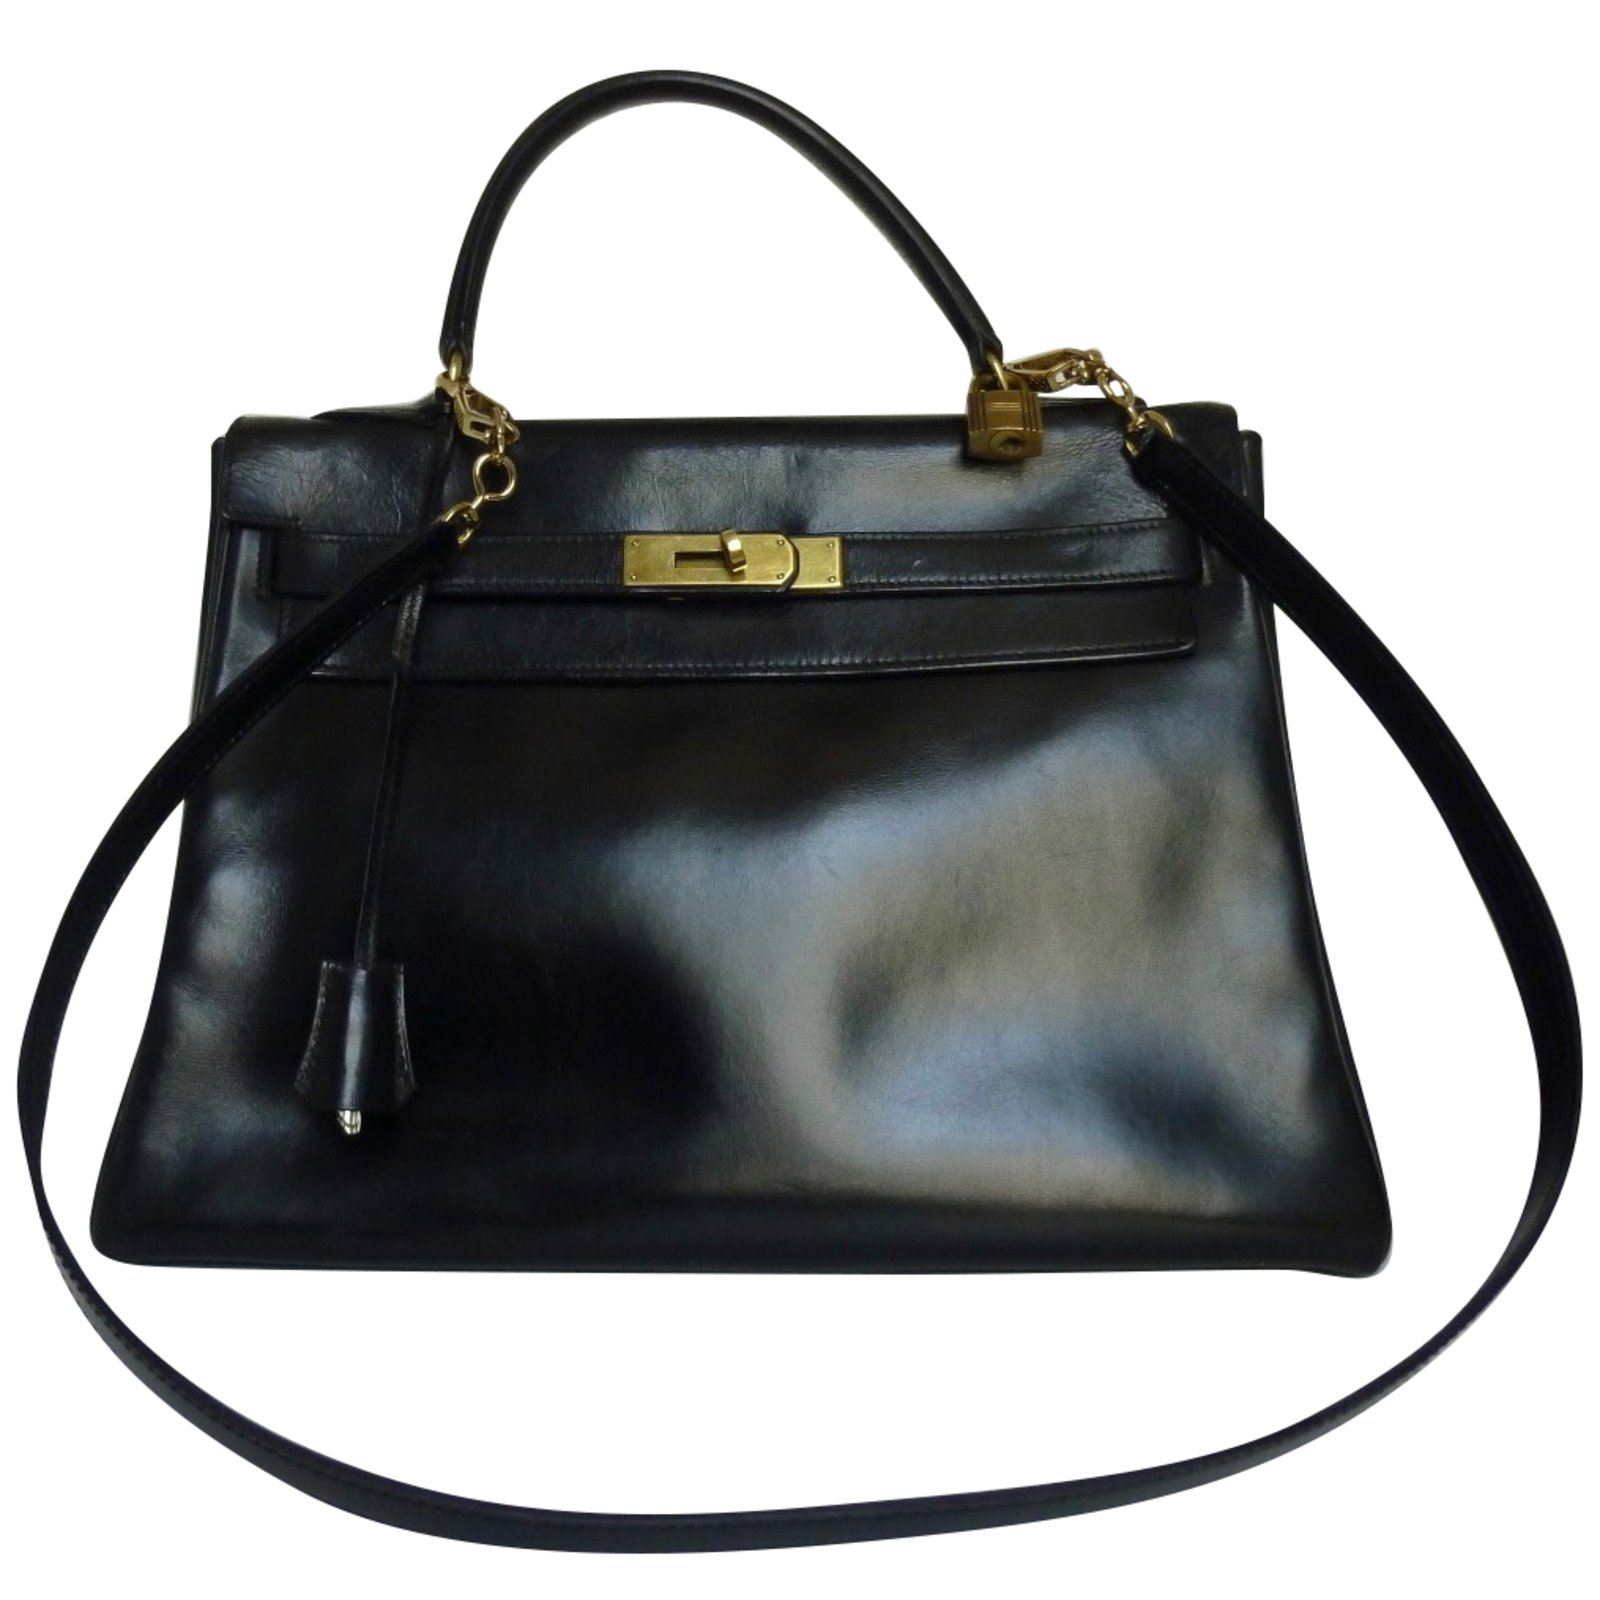 70157 Kelly Sacs Hermès Cuir En 32 Box Noir À Ref Main b67fgyvY